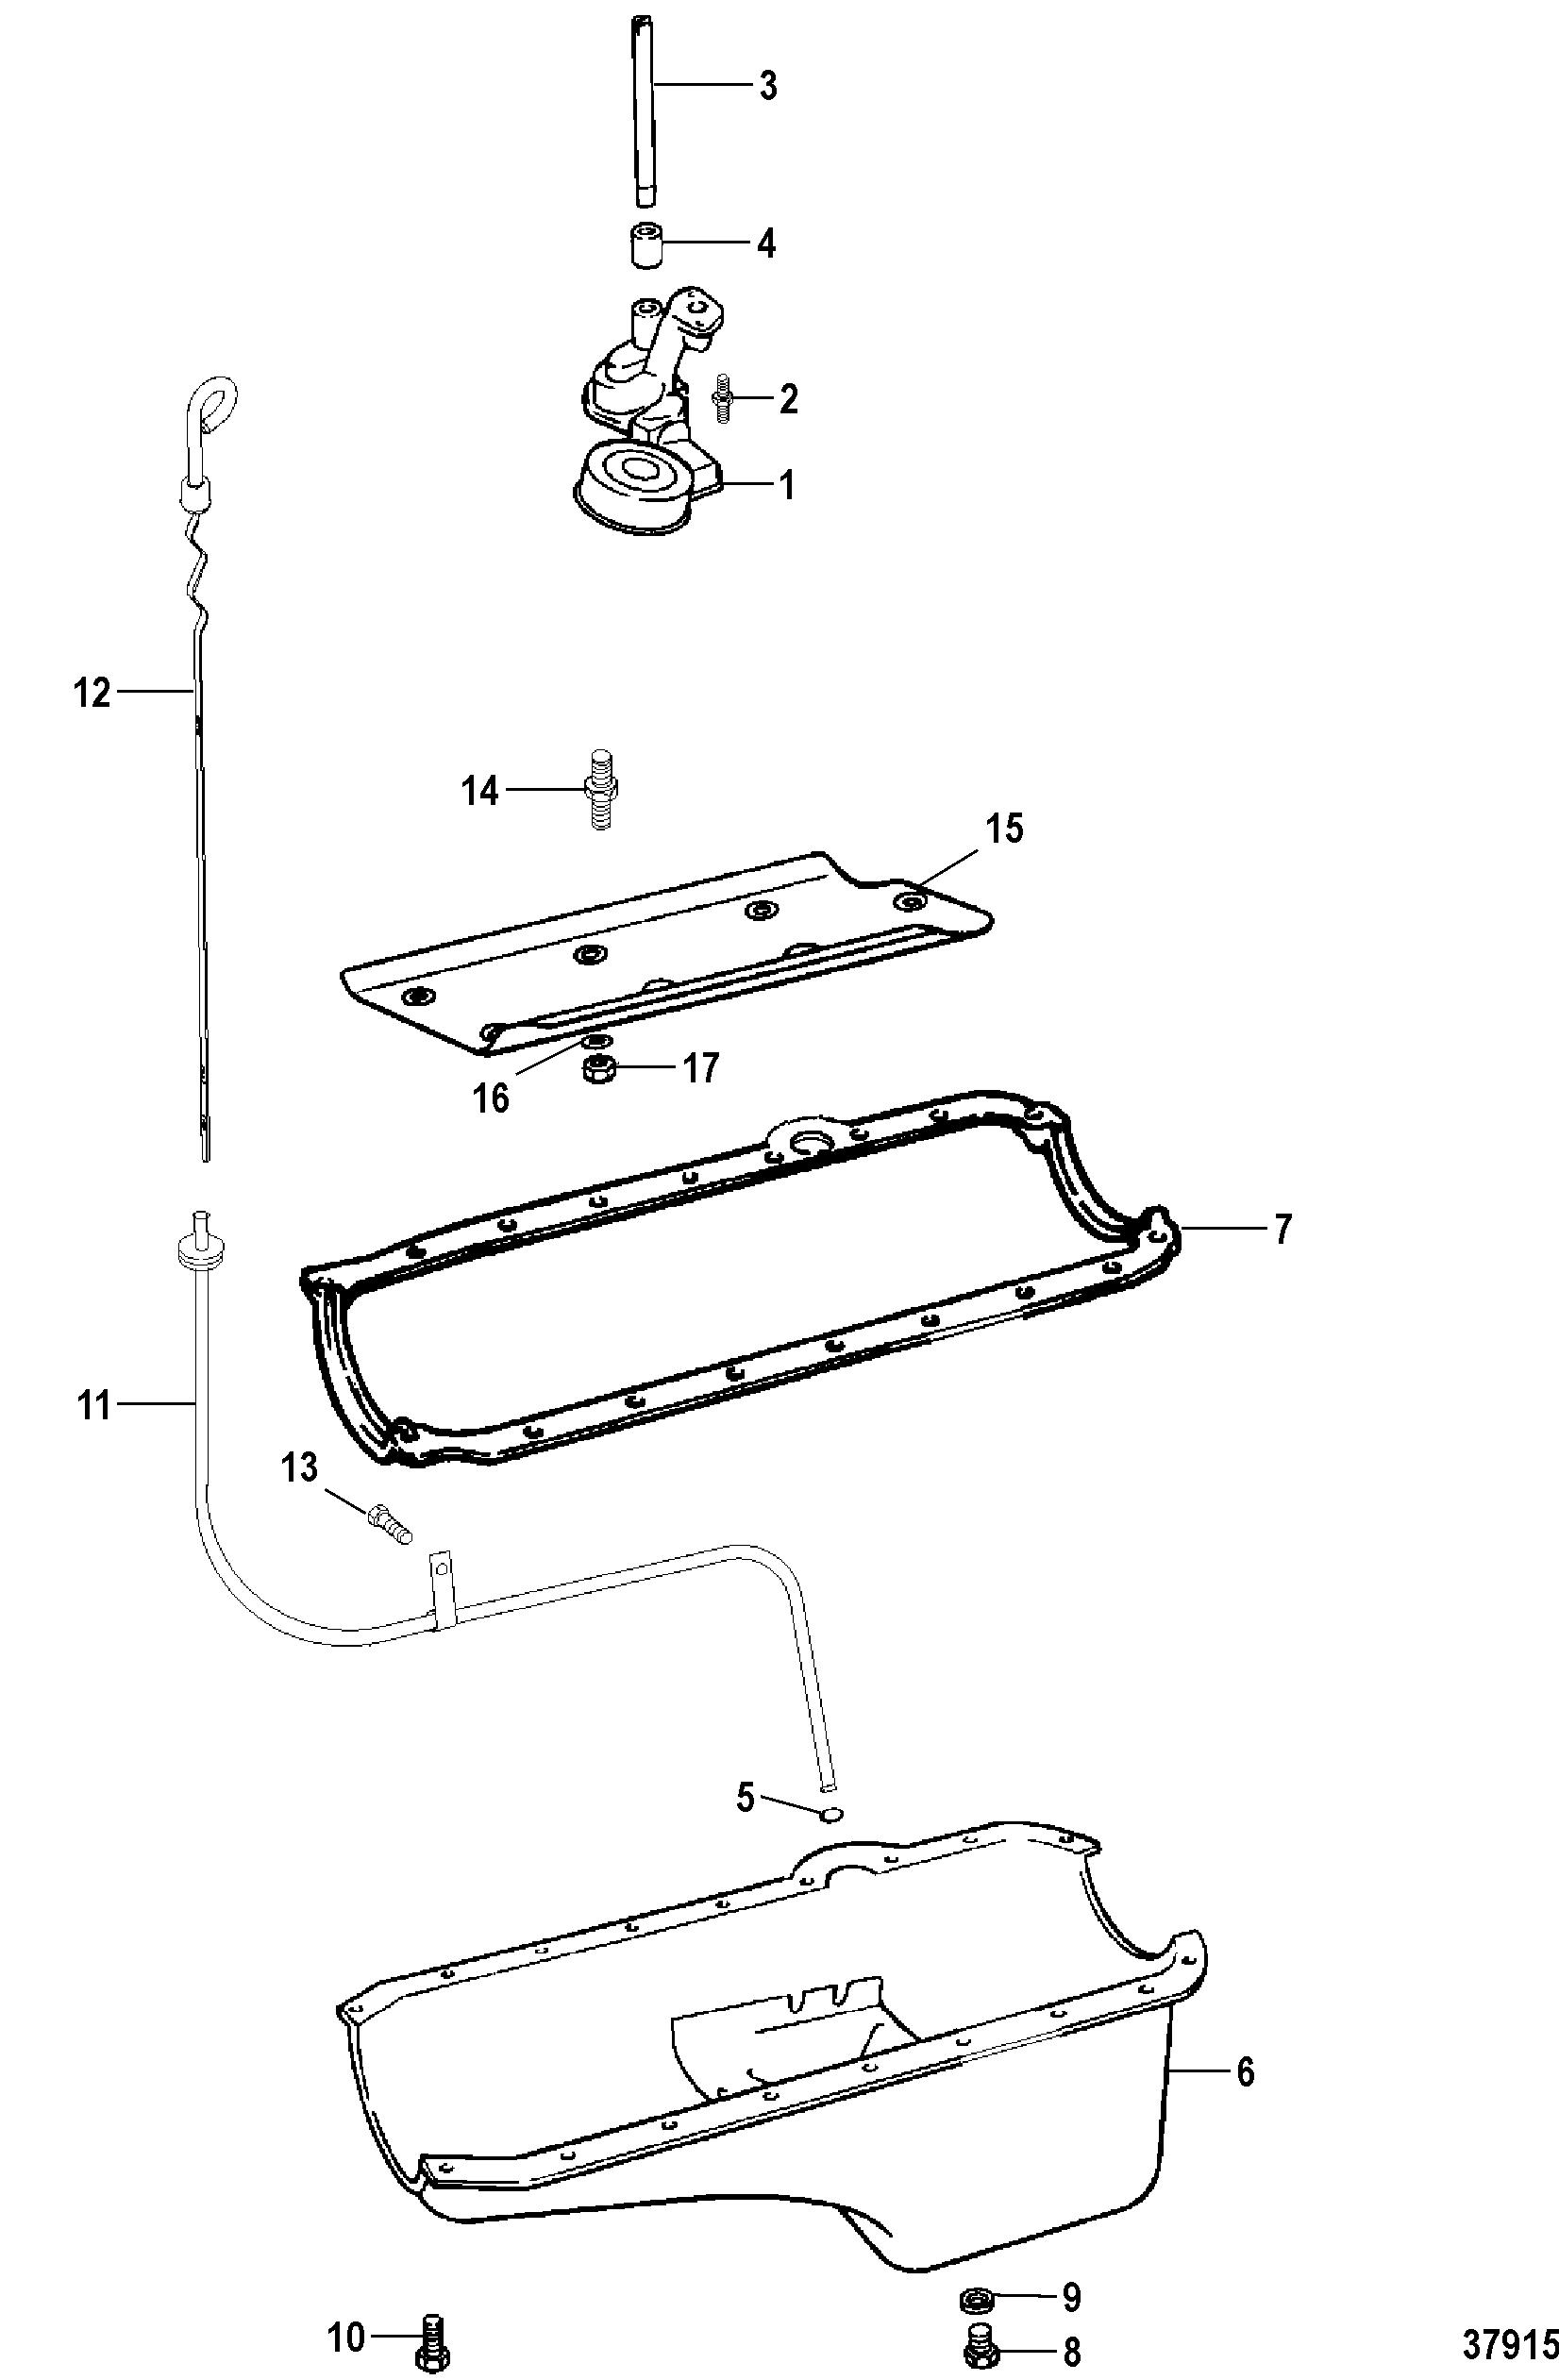 OIL PAN AND OIL PUMP FOR MERCRUISER 7.4L BRAVO I, II, III